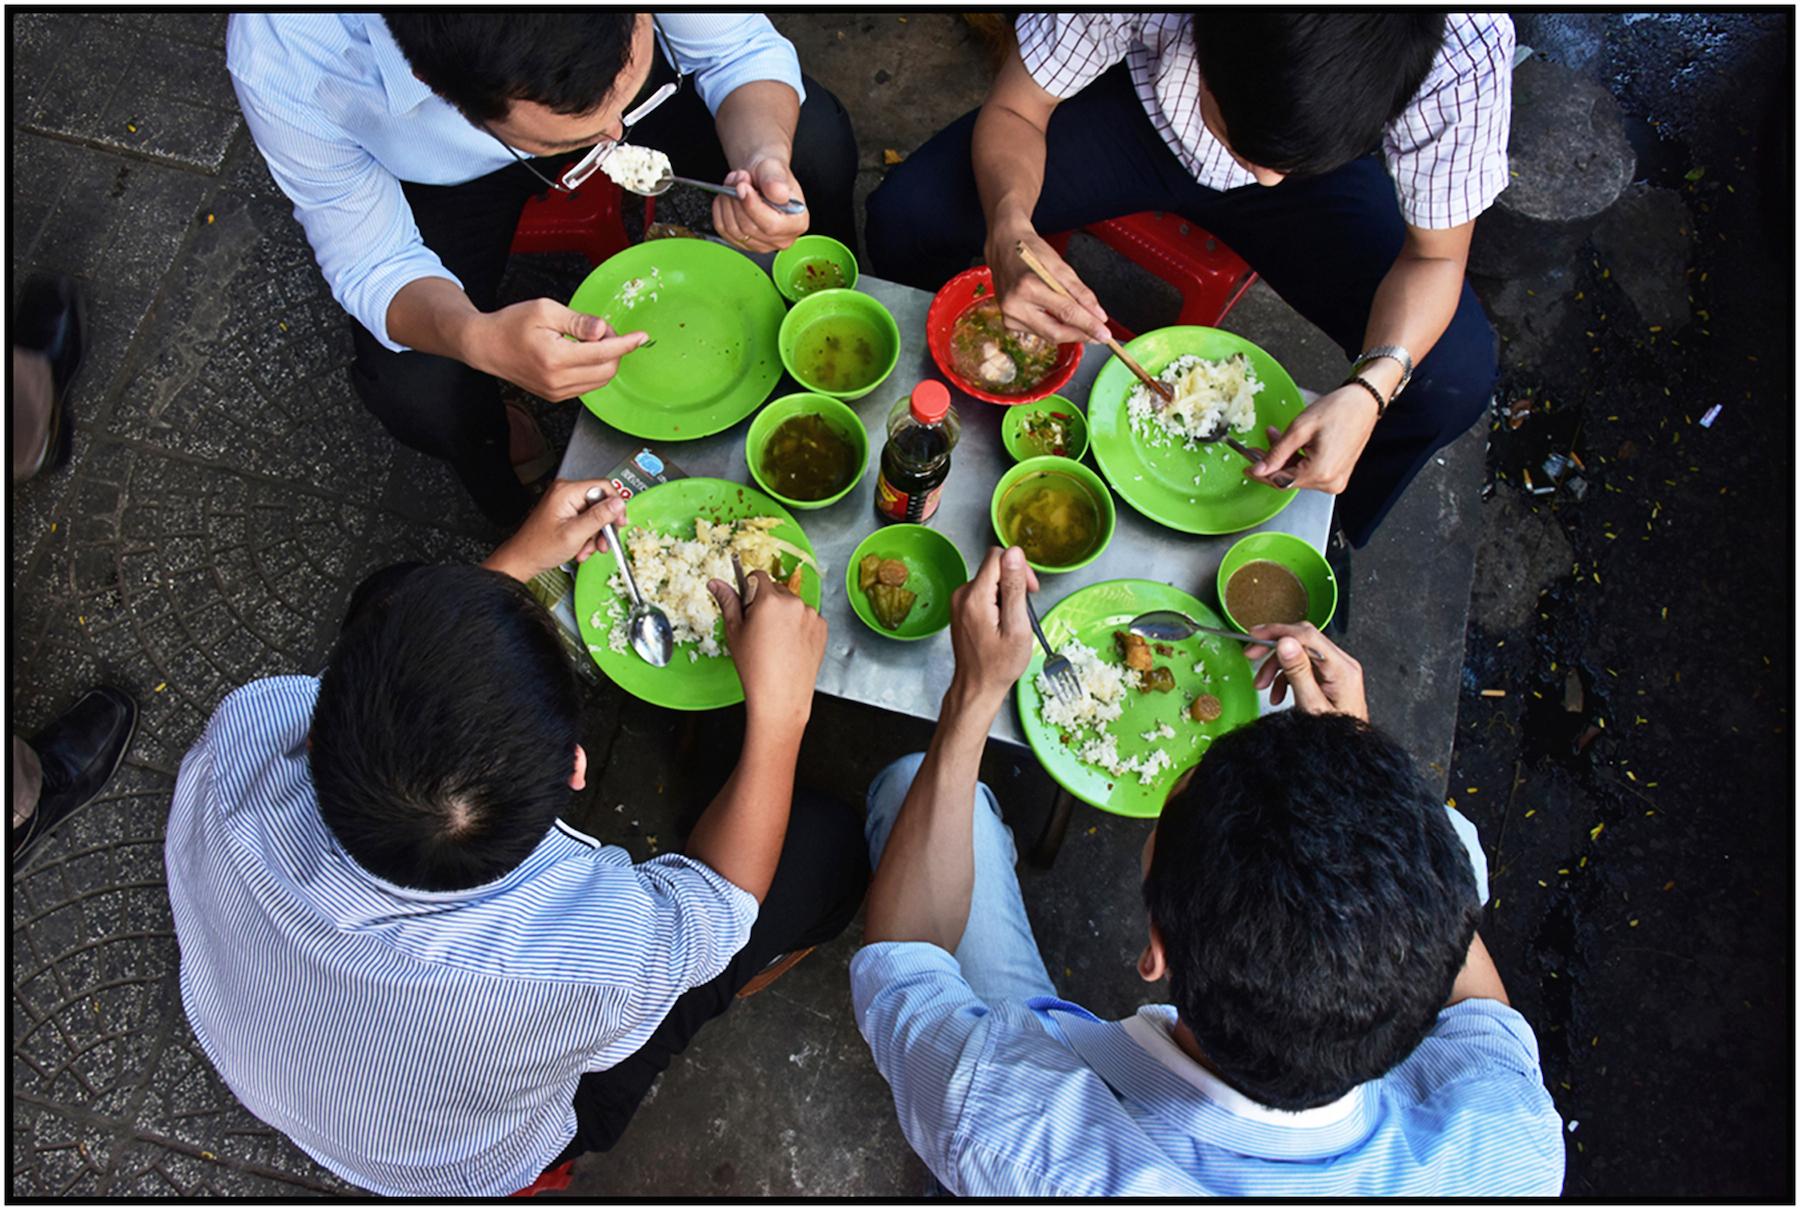 Office workers eat lunch on sidewalk, downtown Saigon/HCMC, Dec. 2015. #6226